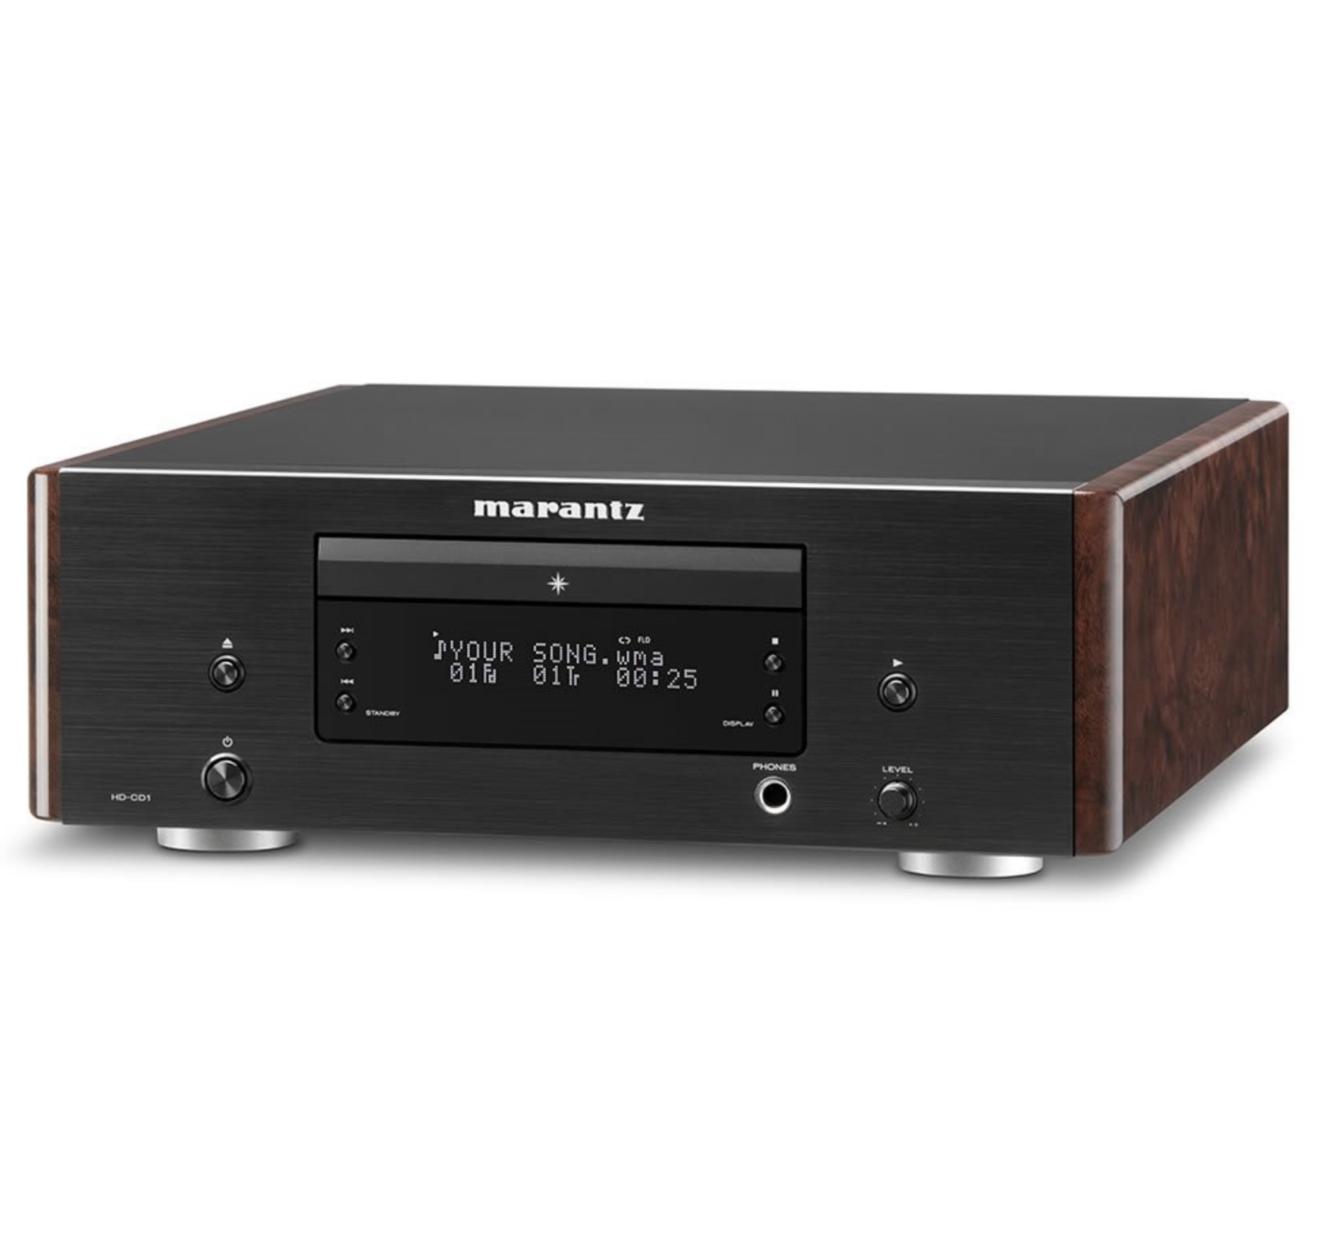 Cd Player Marantz HD-CD1 High Definition Cd / Cd-R/Rw / Wma / MP3 / Aac